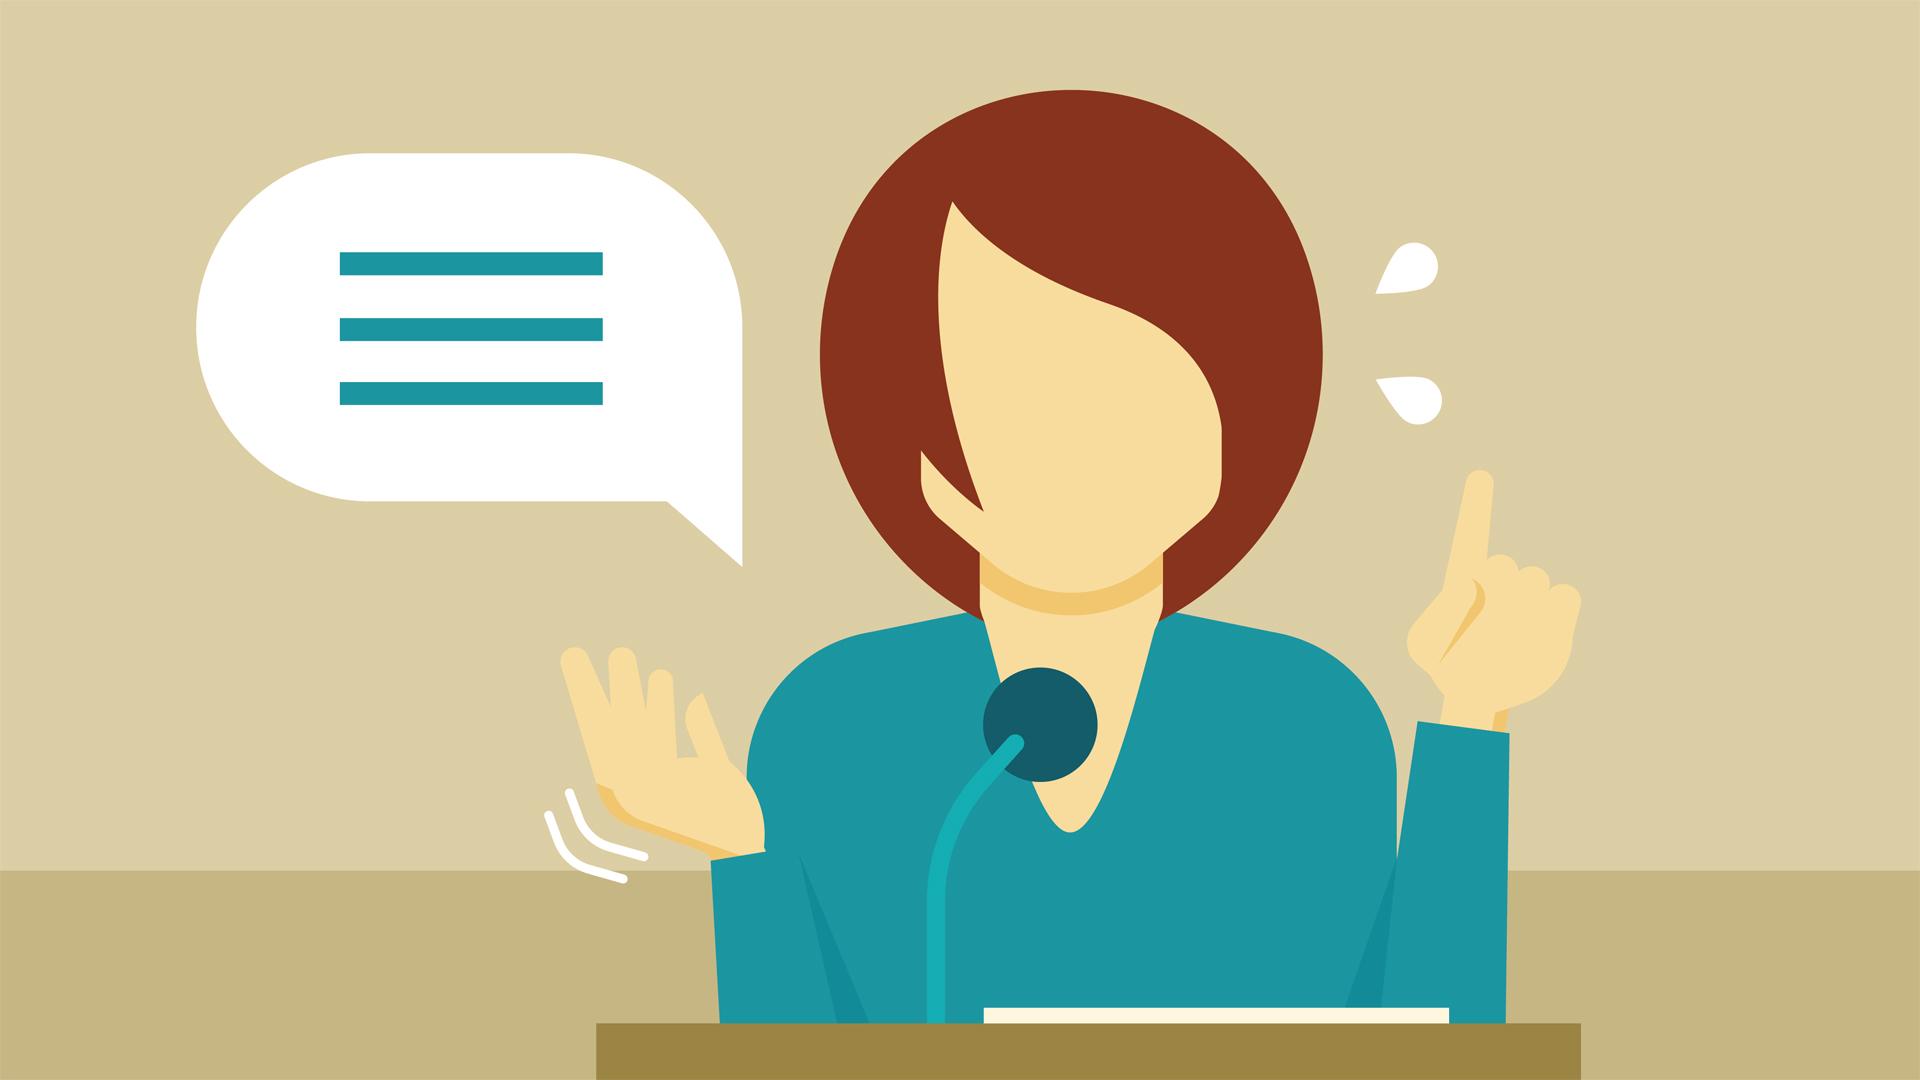 Fear clipart scared public speaking Overcoming  Public of Fear